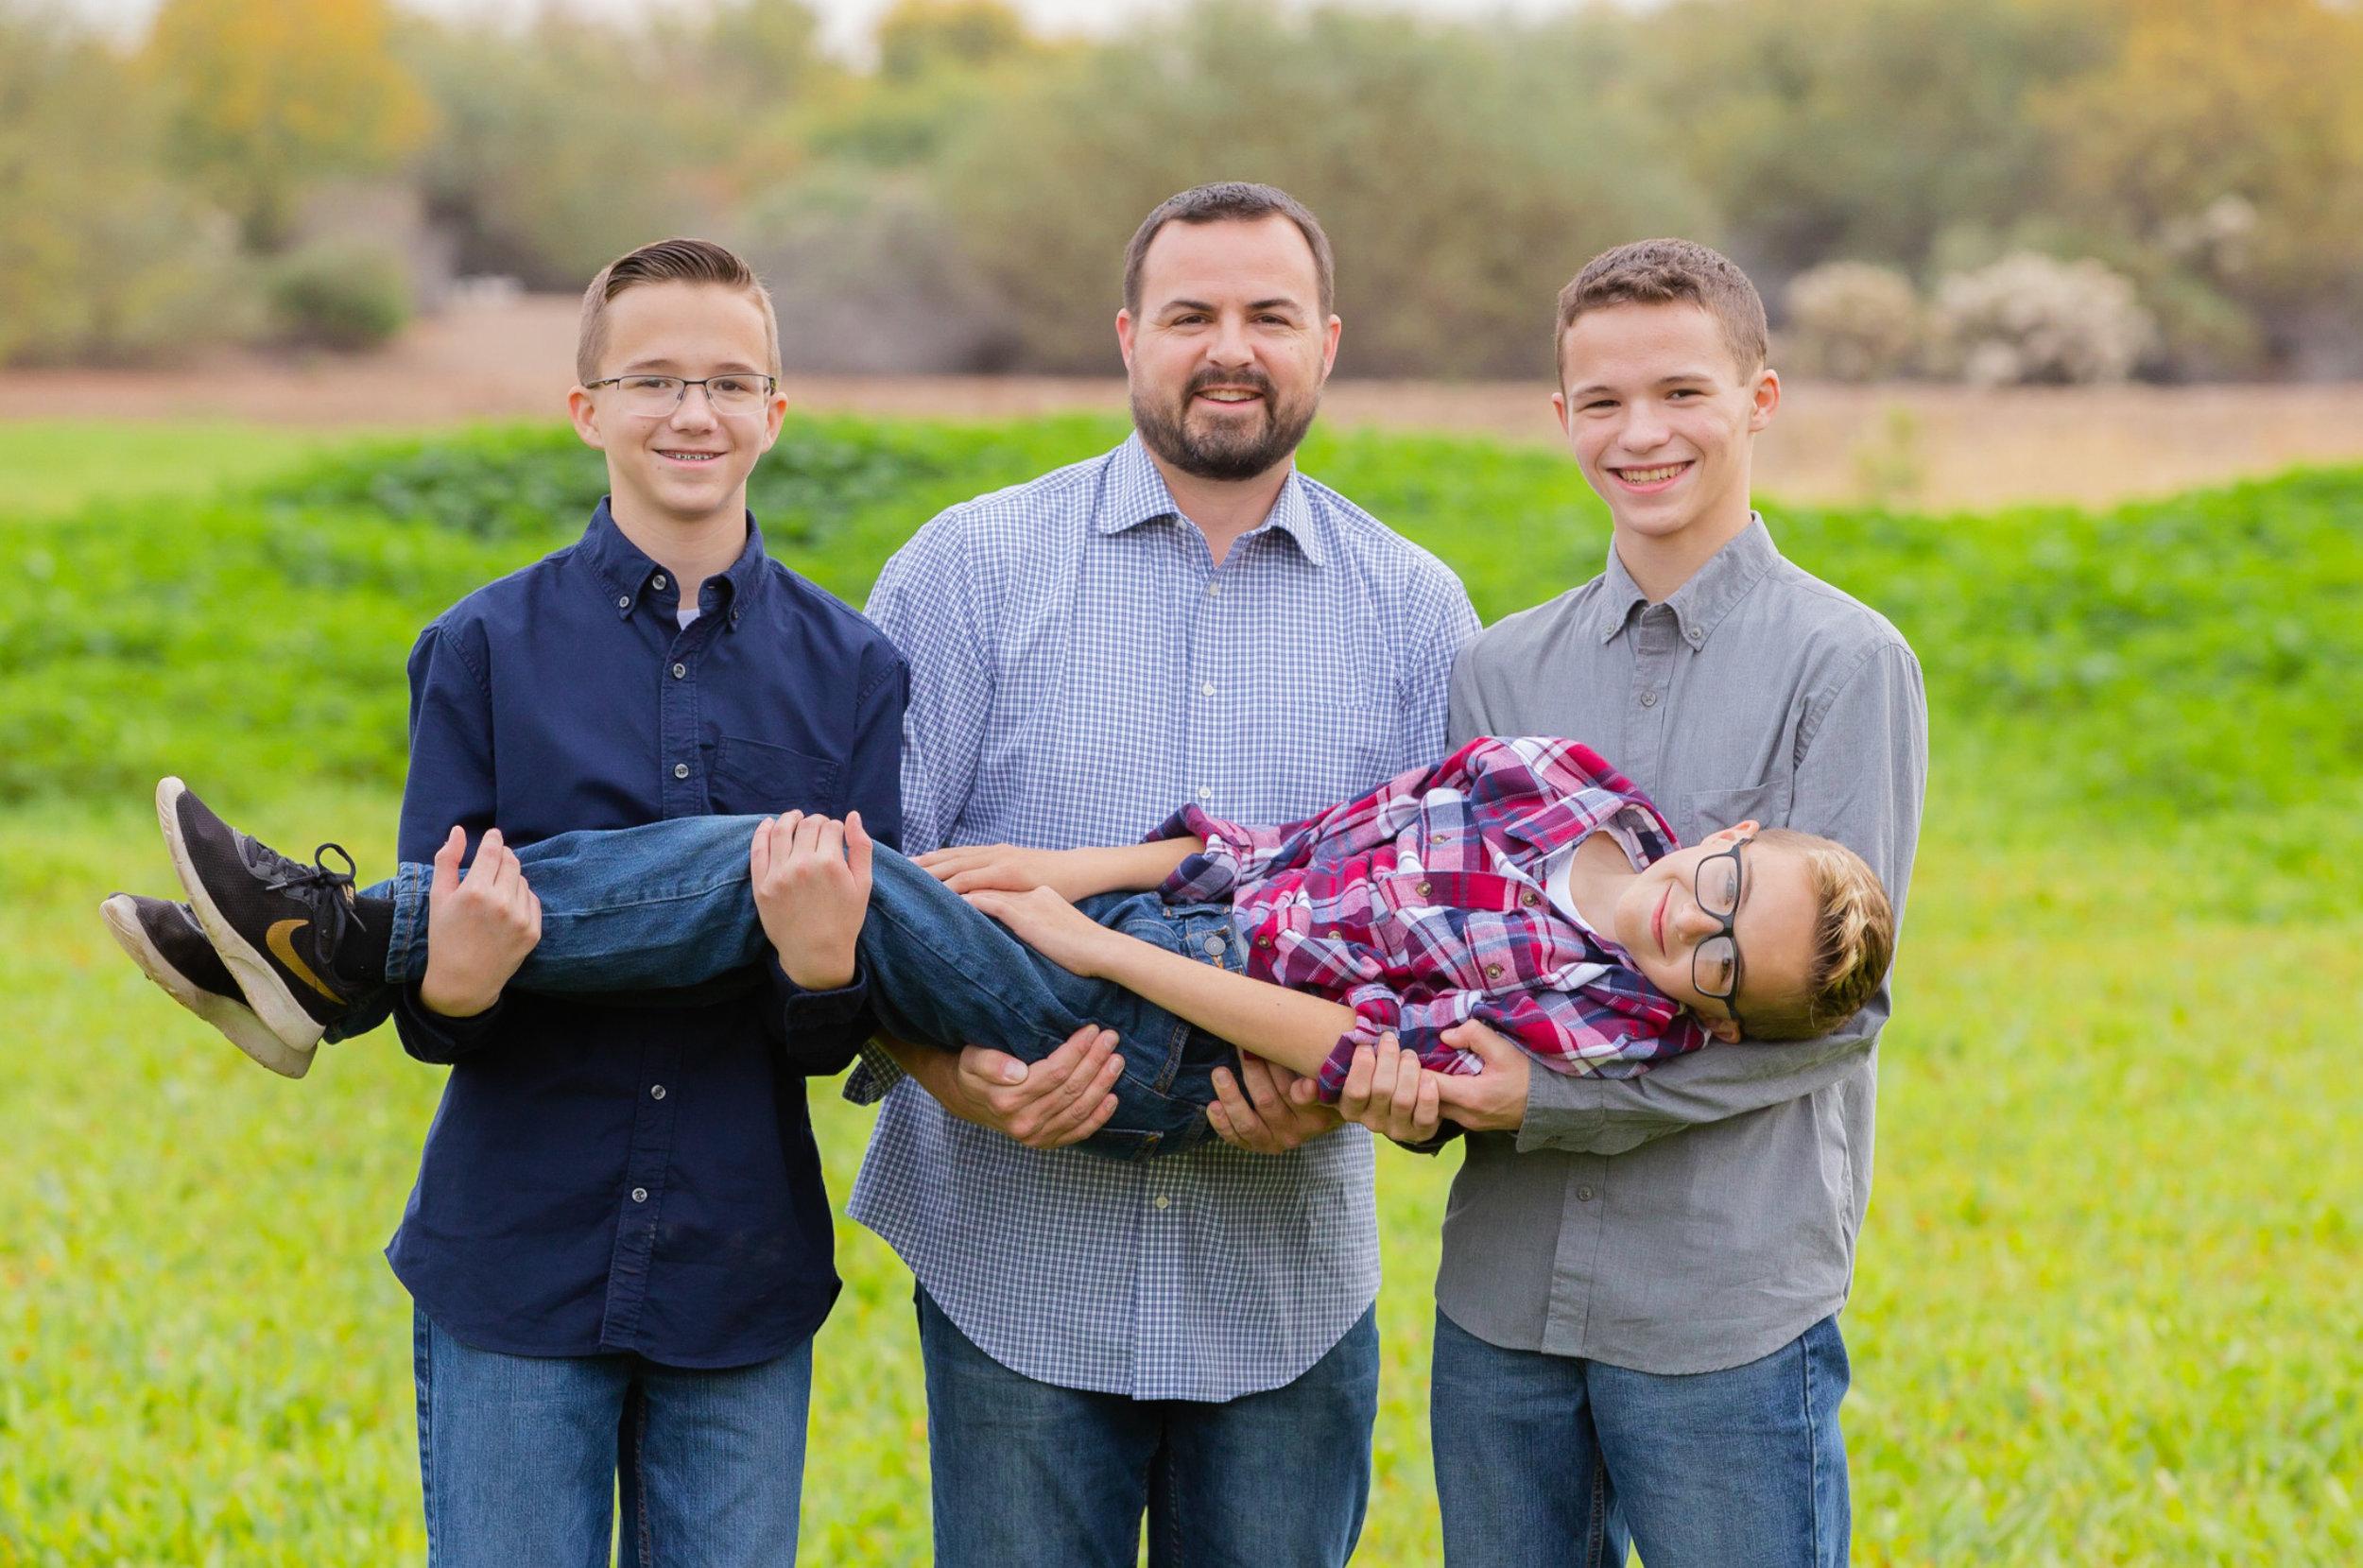 David-Orr-Photography_Fun-Family-Portraits-web.jpg